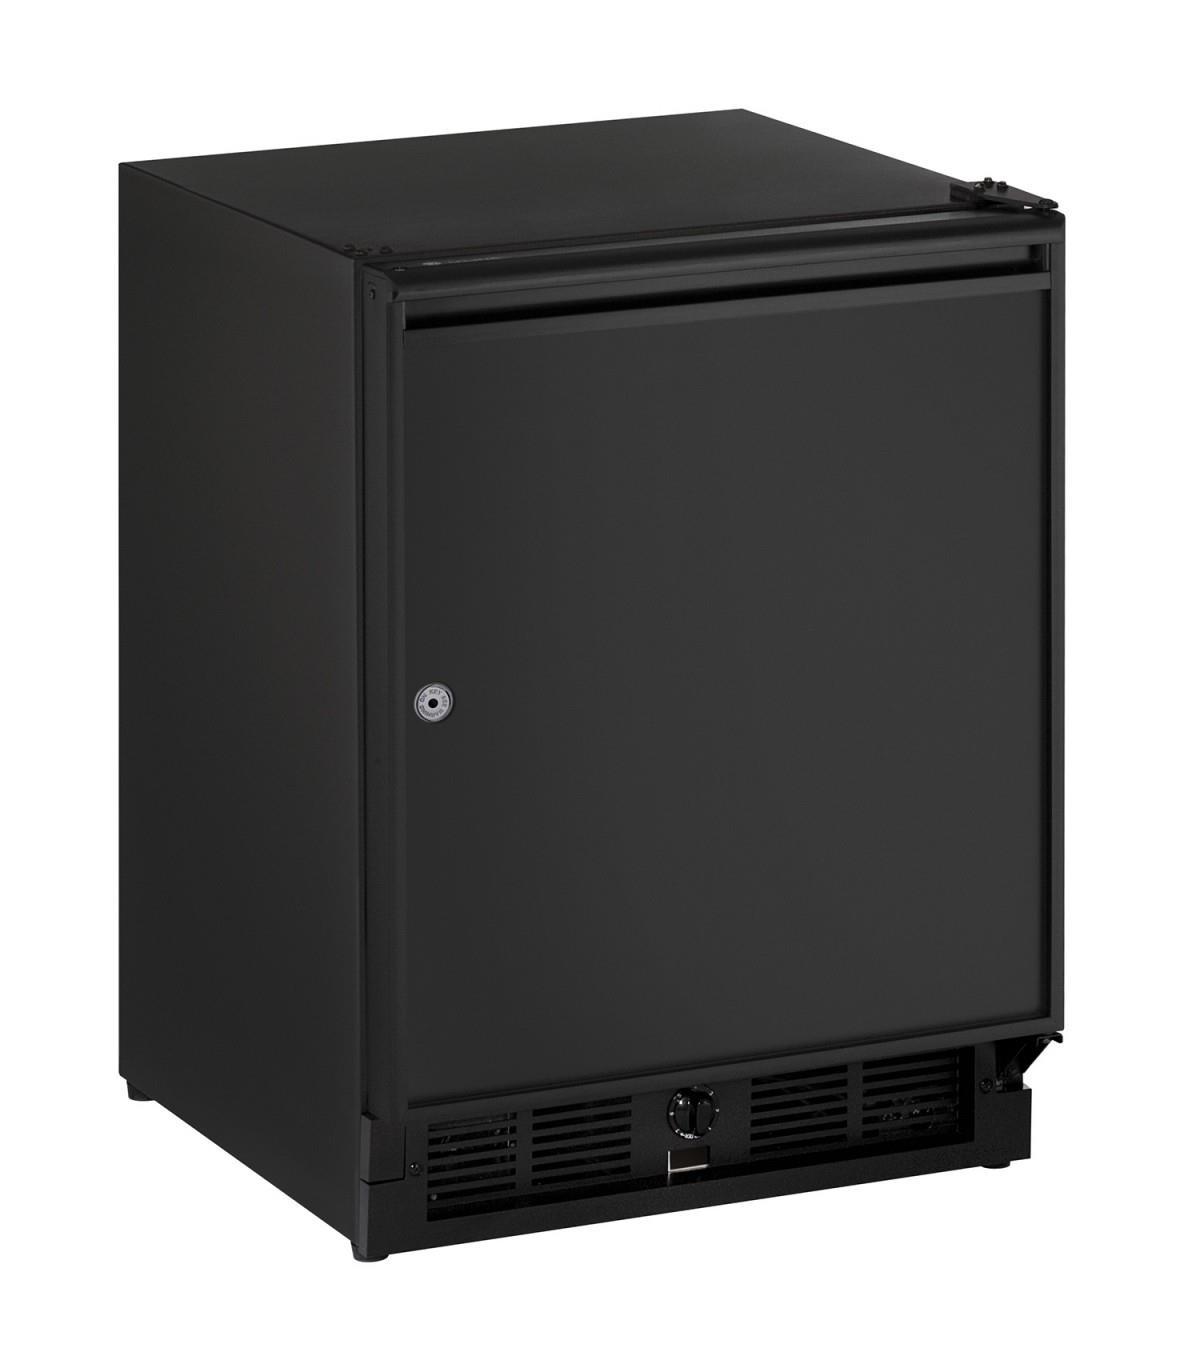 "U-Line Refrigerators 3.3 Cu. Ft. 18"" Compact All-Refrigerator - Item Number: U-29RB-15A"